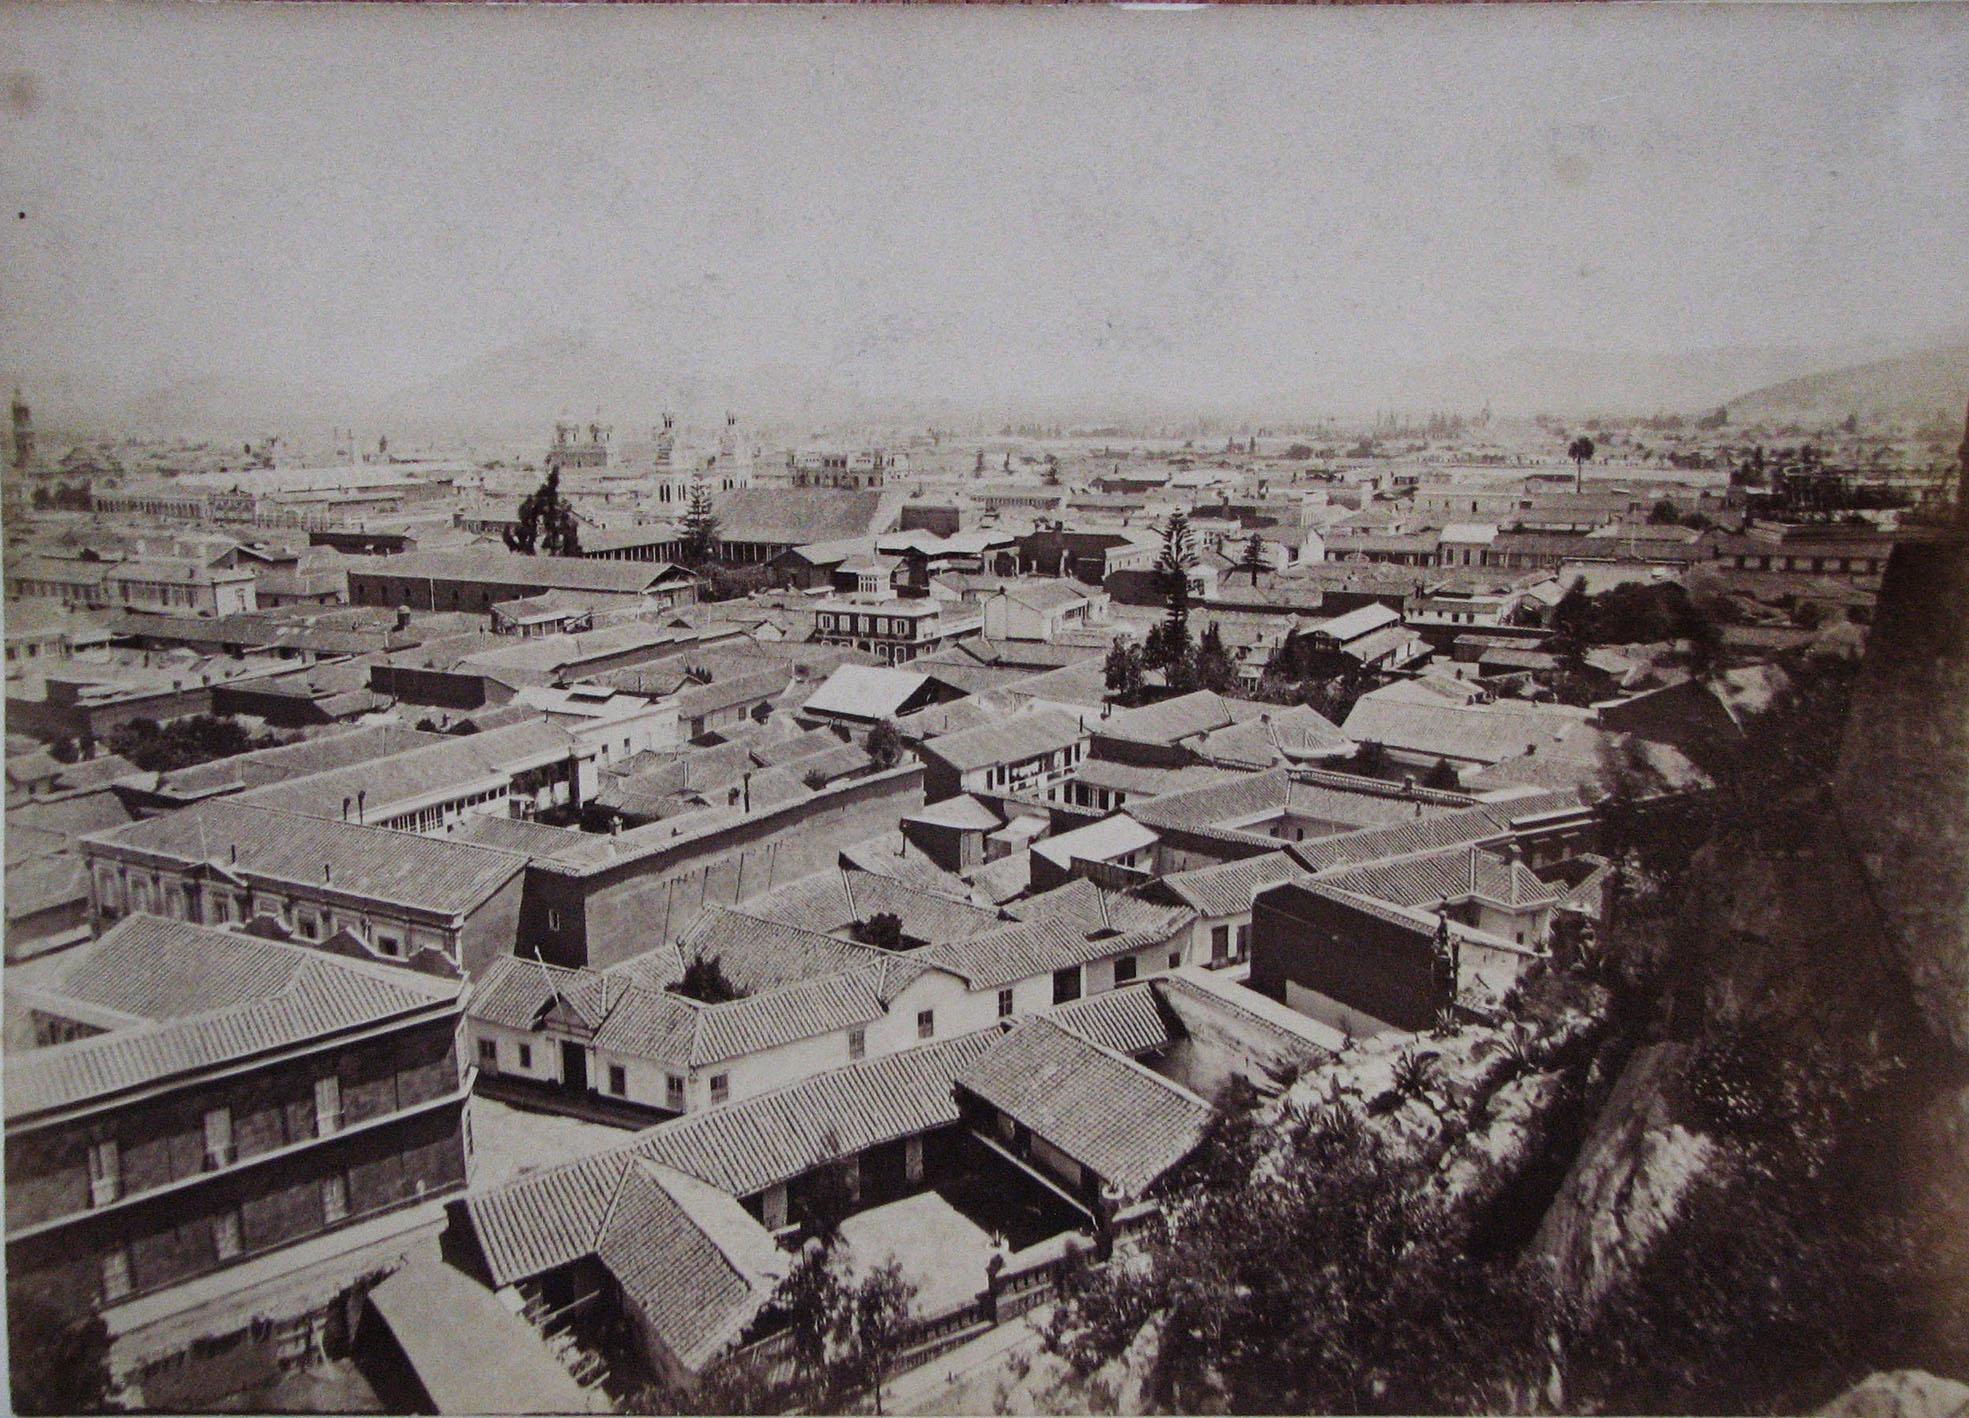 Enterreno - Fotos históricas de chile - fotos antiguas de Chile - Centro de Santiago en 1890